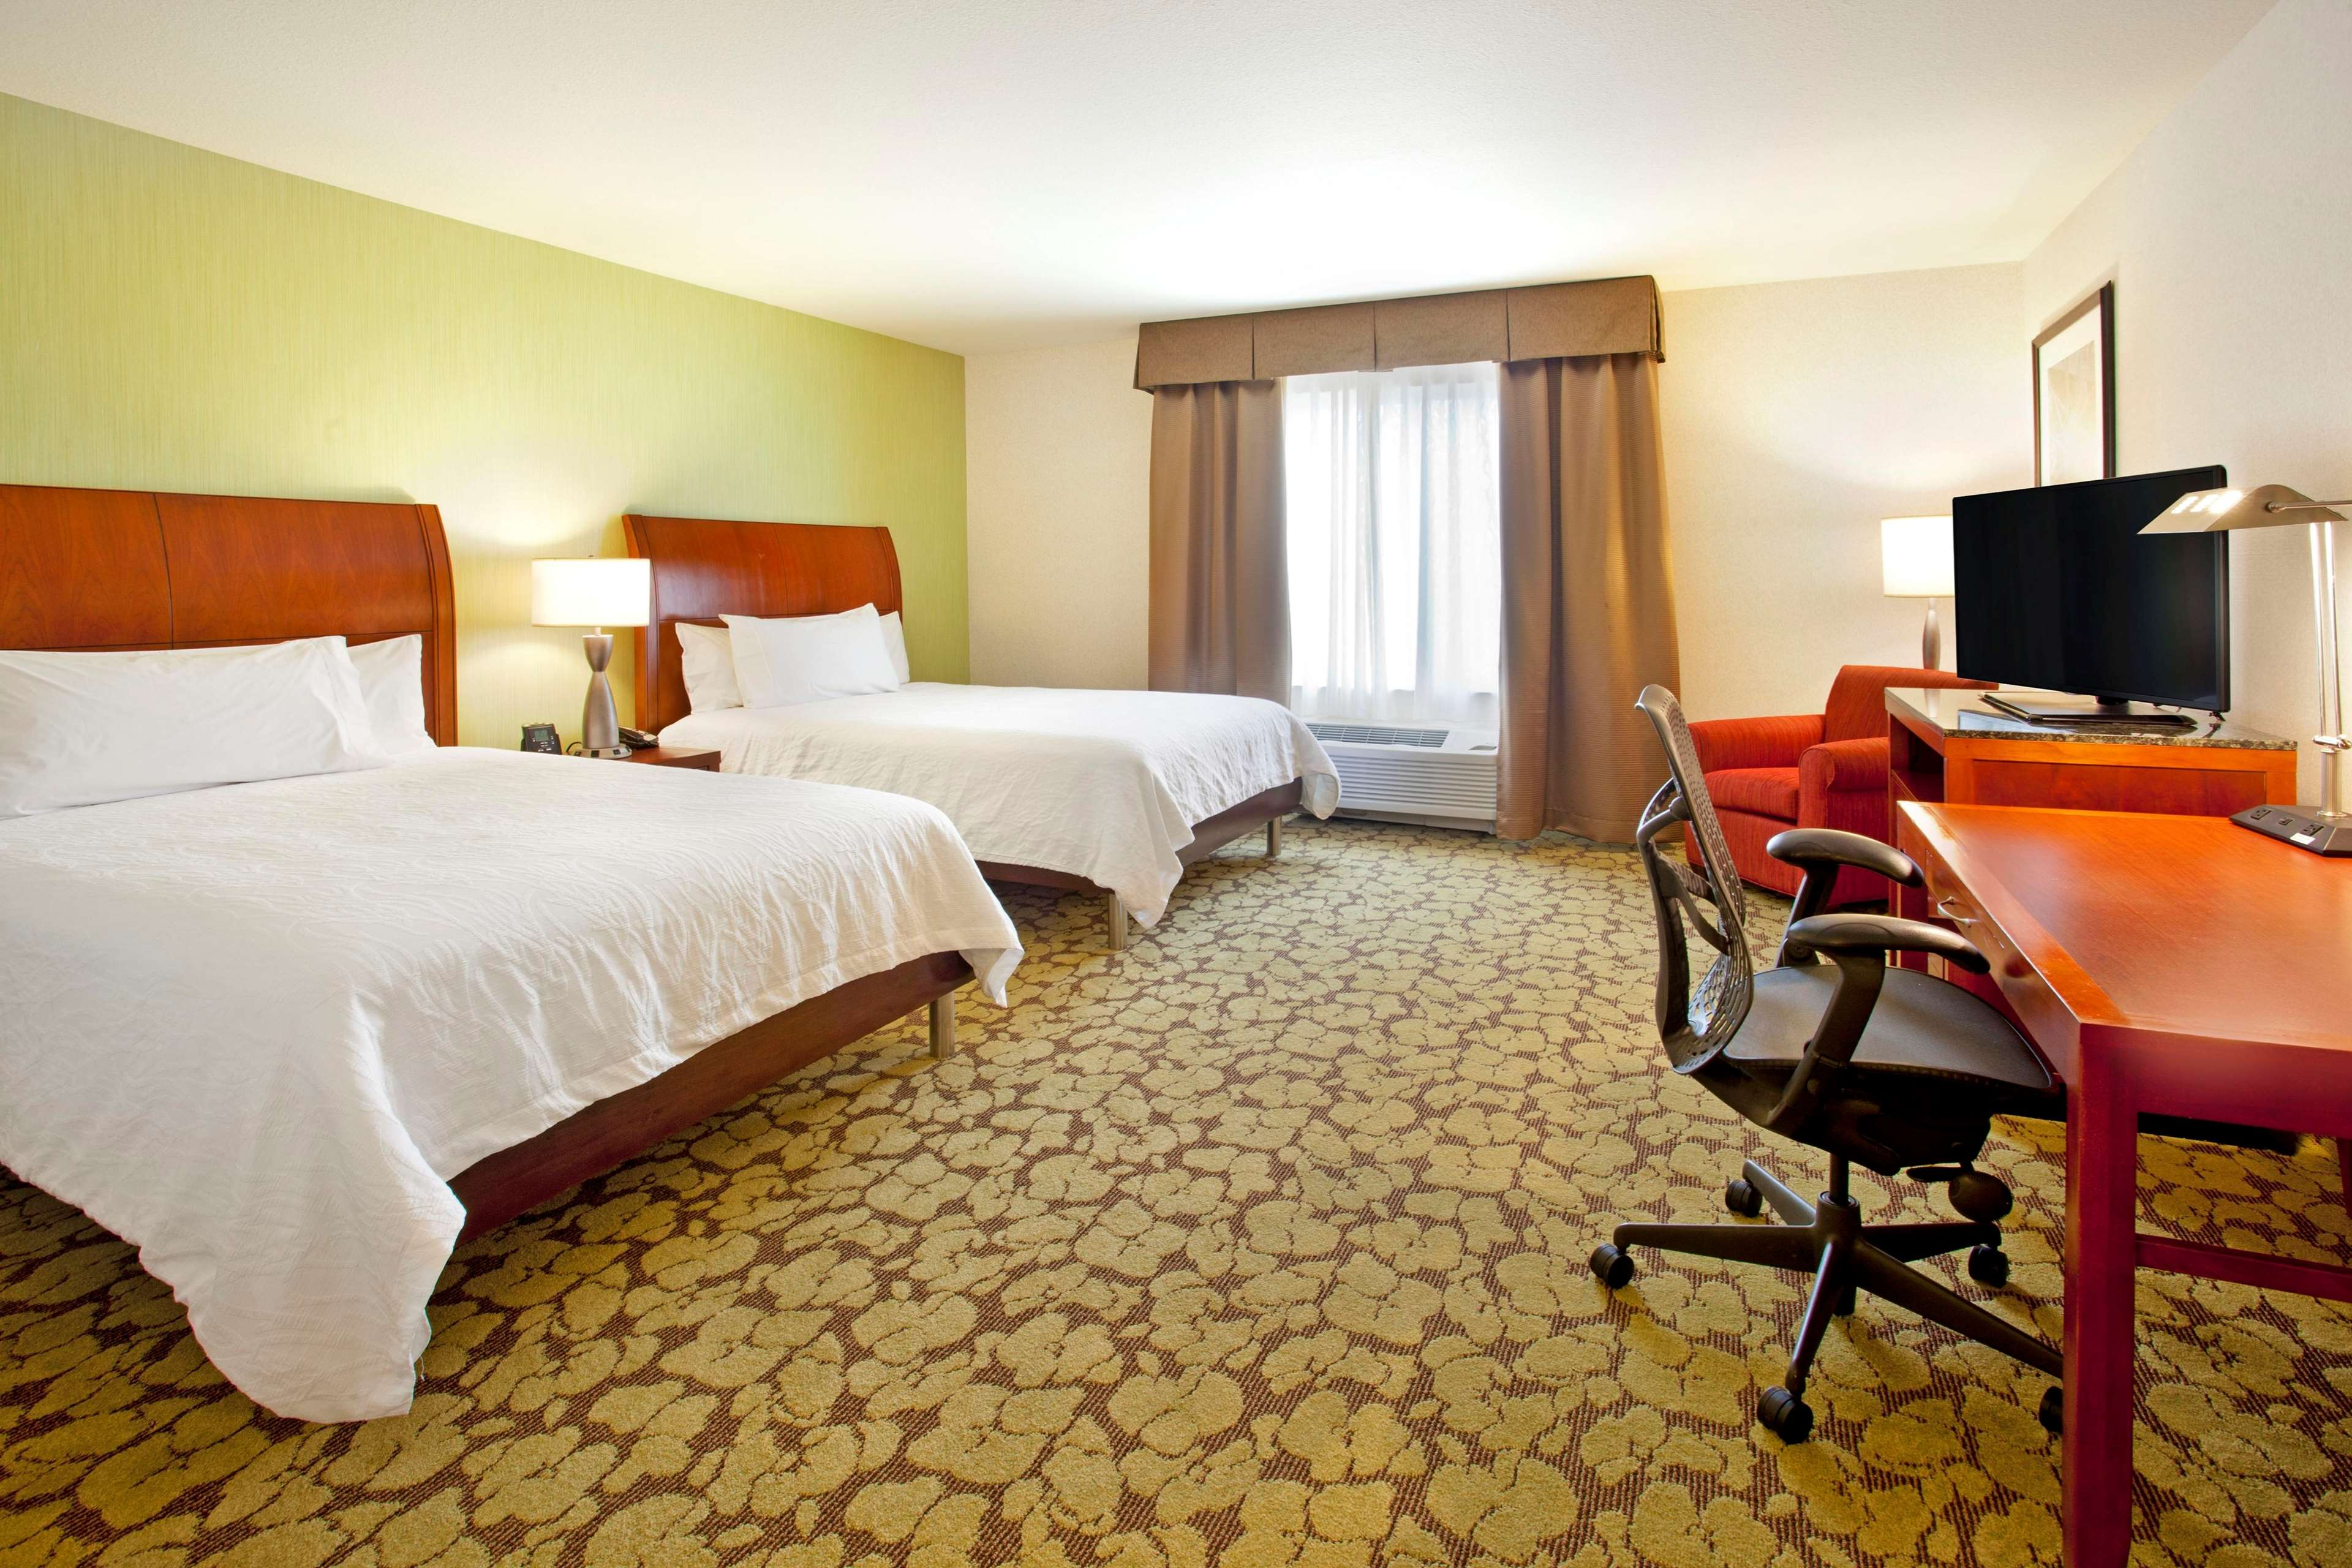 Hilton Garden Inn Fort Collins image 26